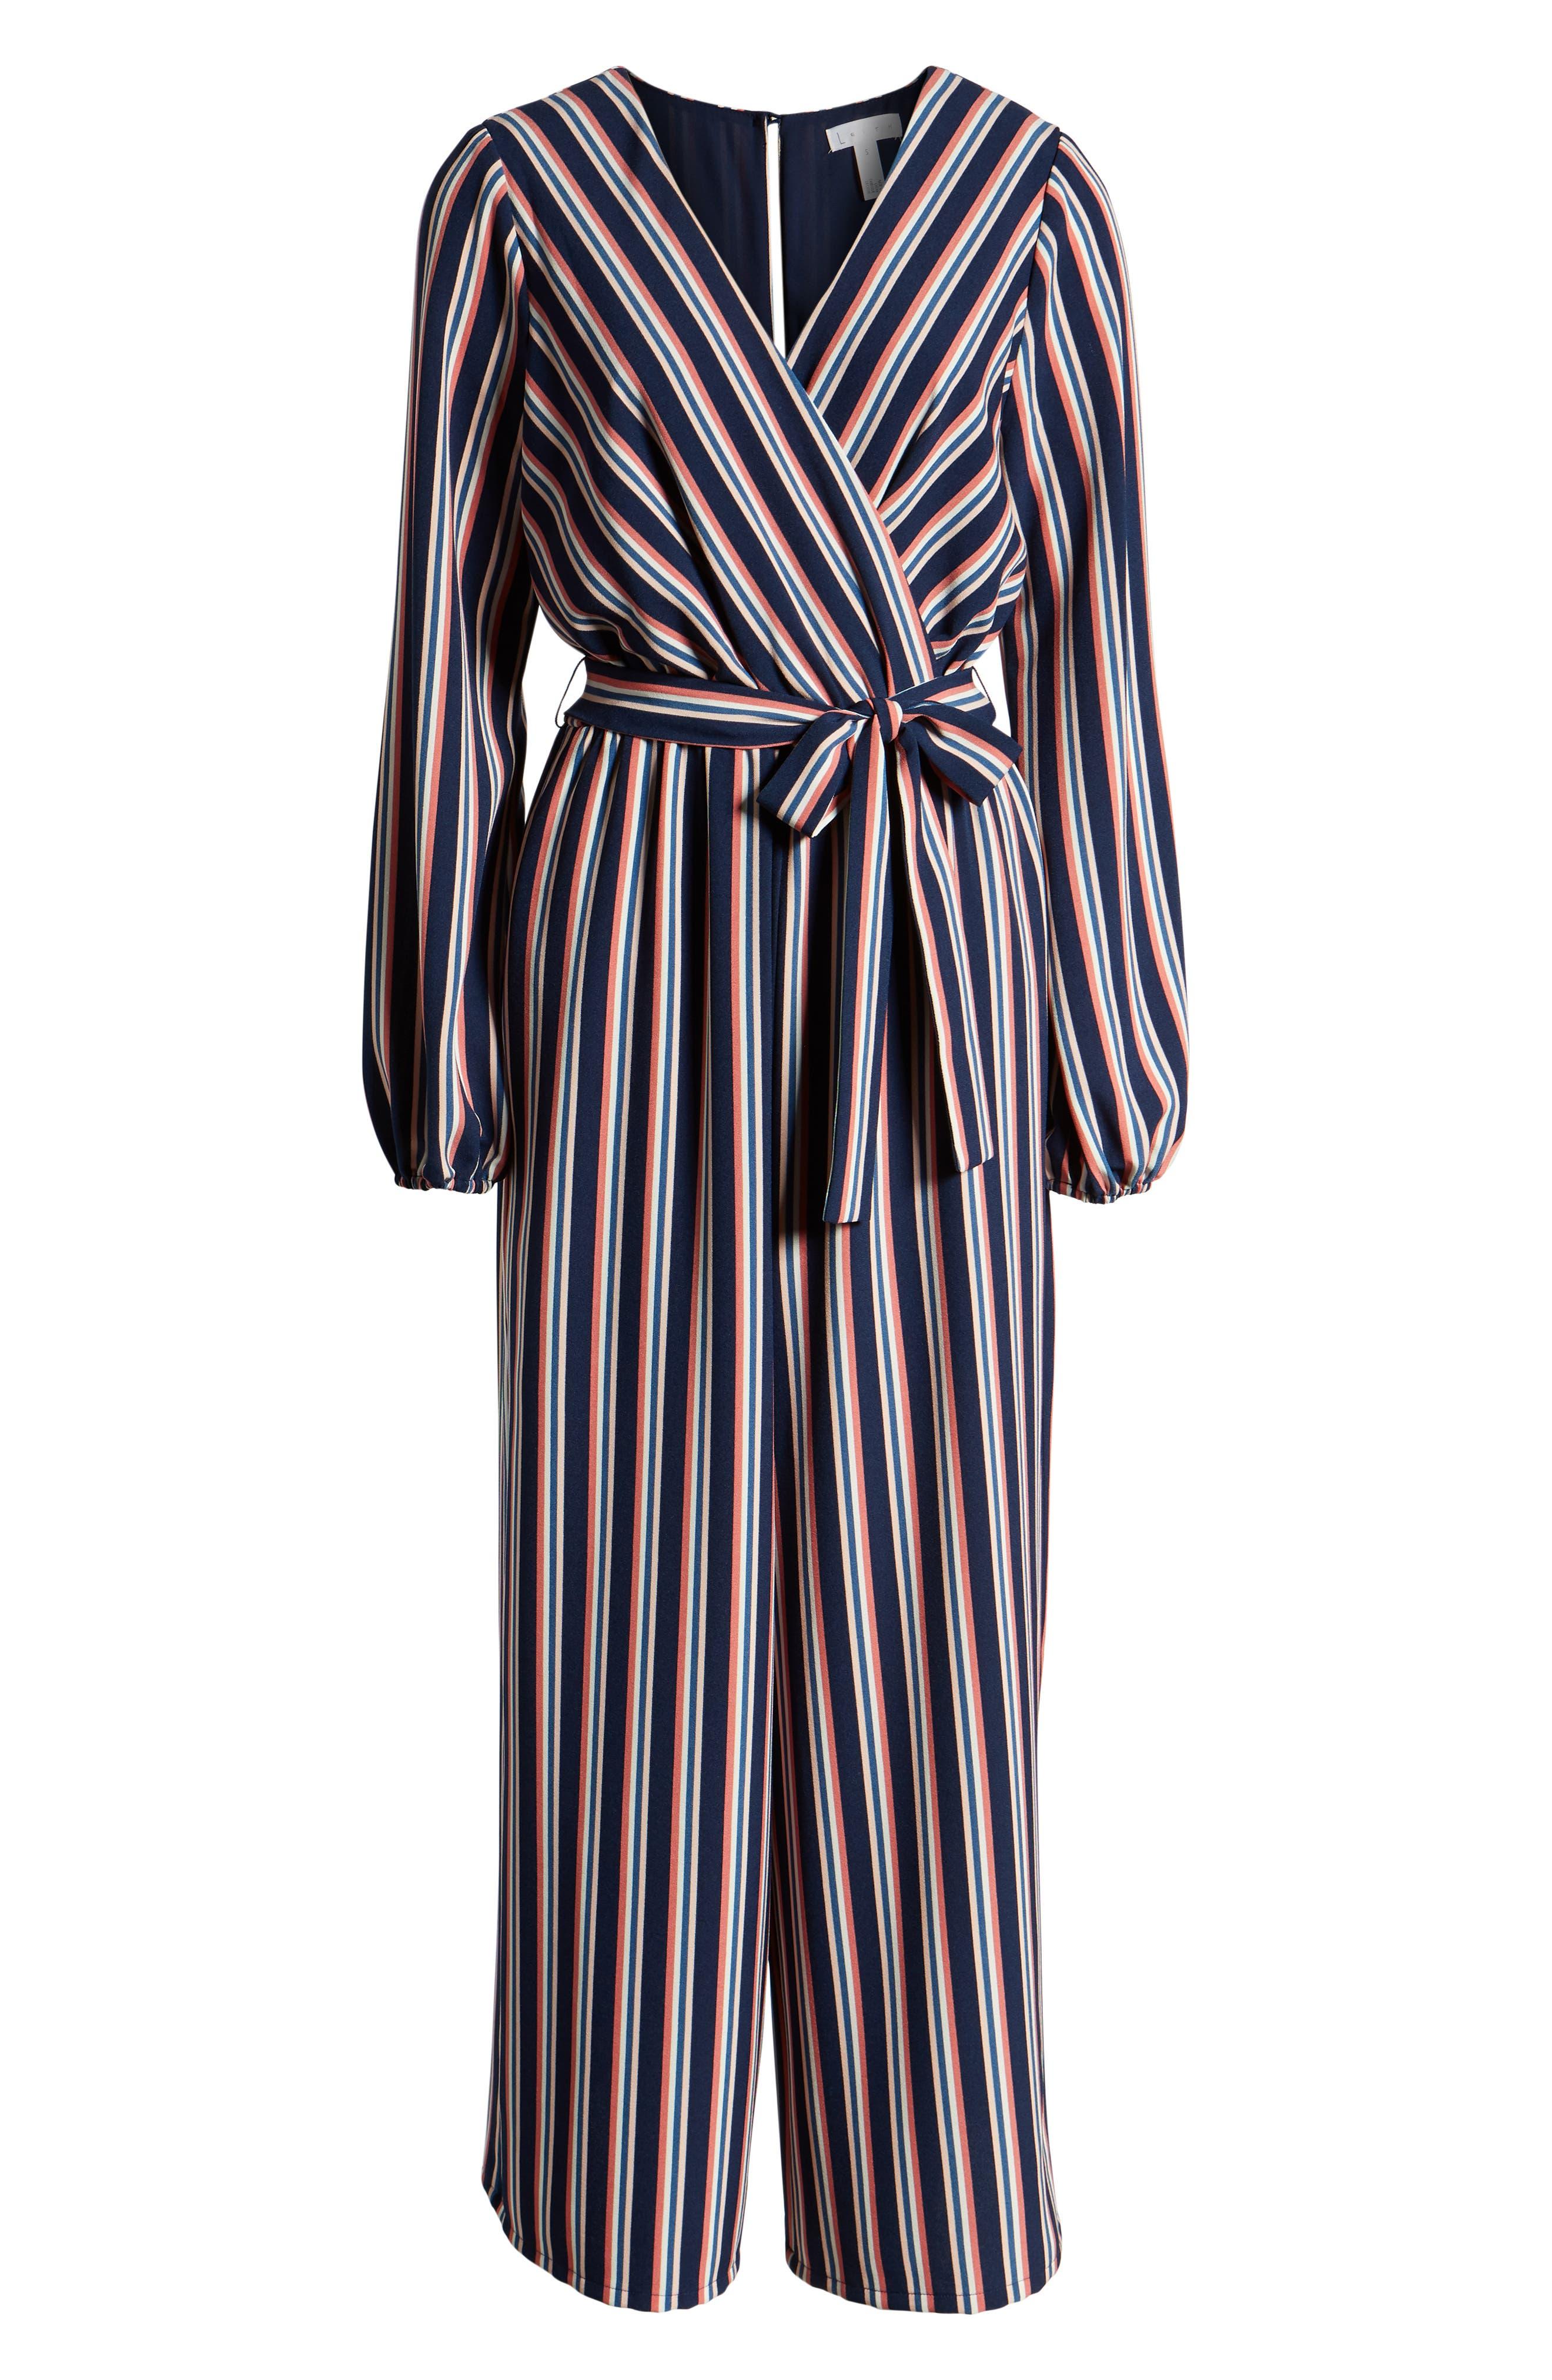 LEITH, Stripe Surplice Jumpsuit, Alternate thumbnail 7, color, NAVY PEACOAT FEM STRIPE